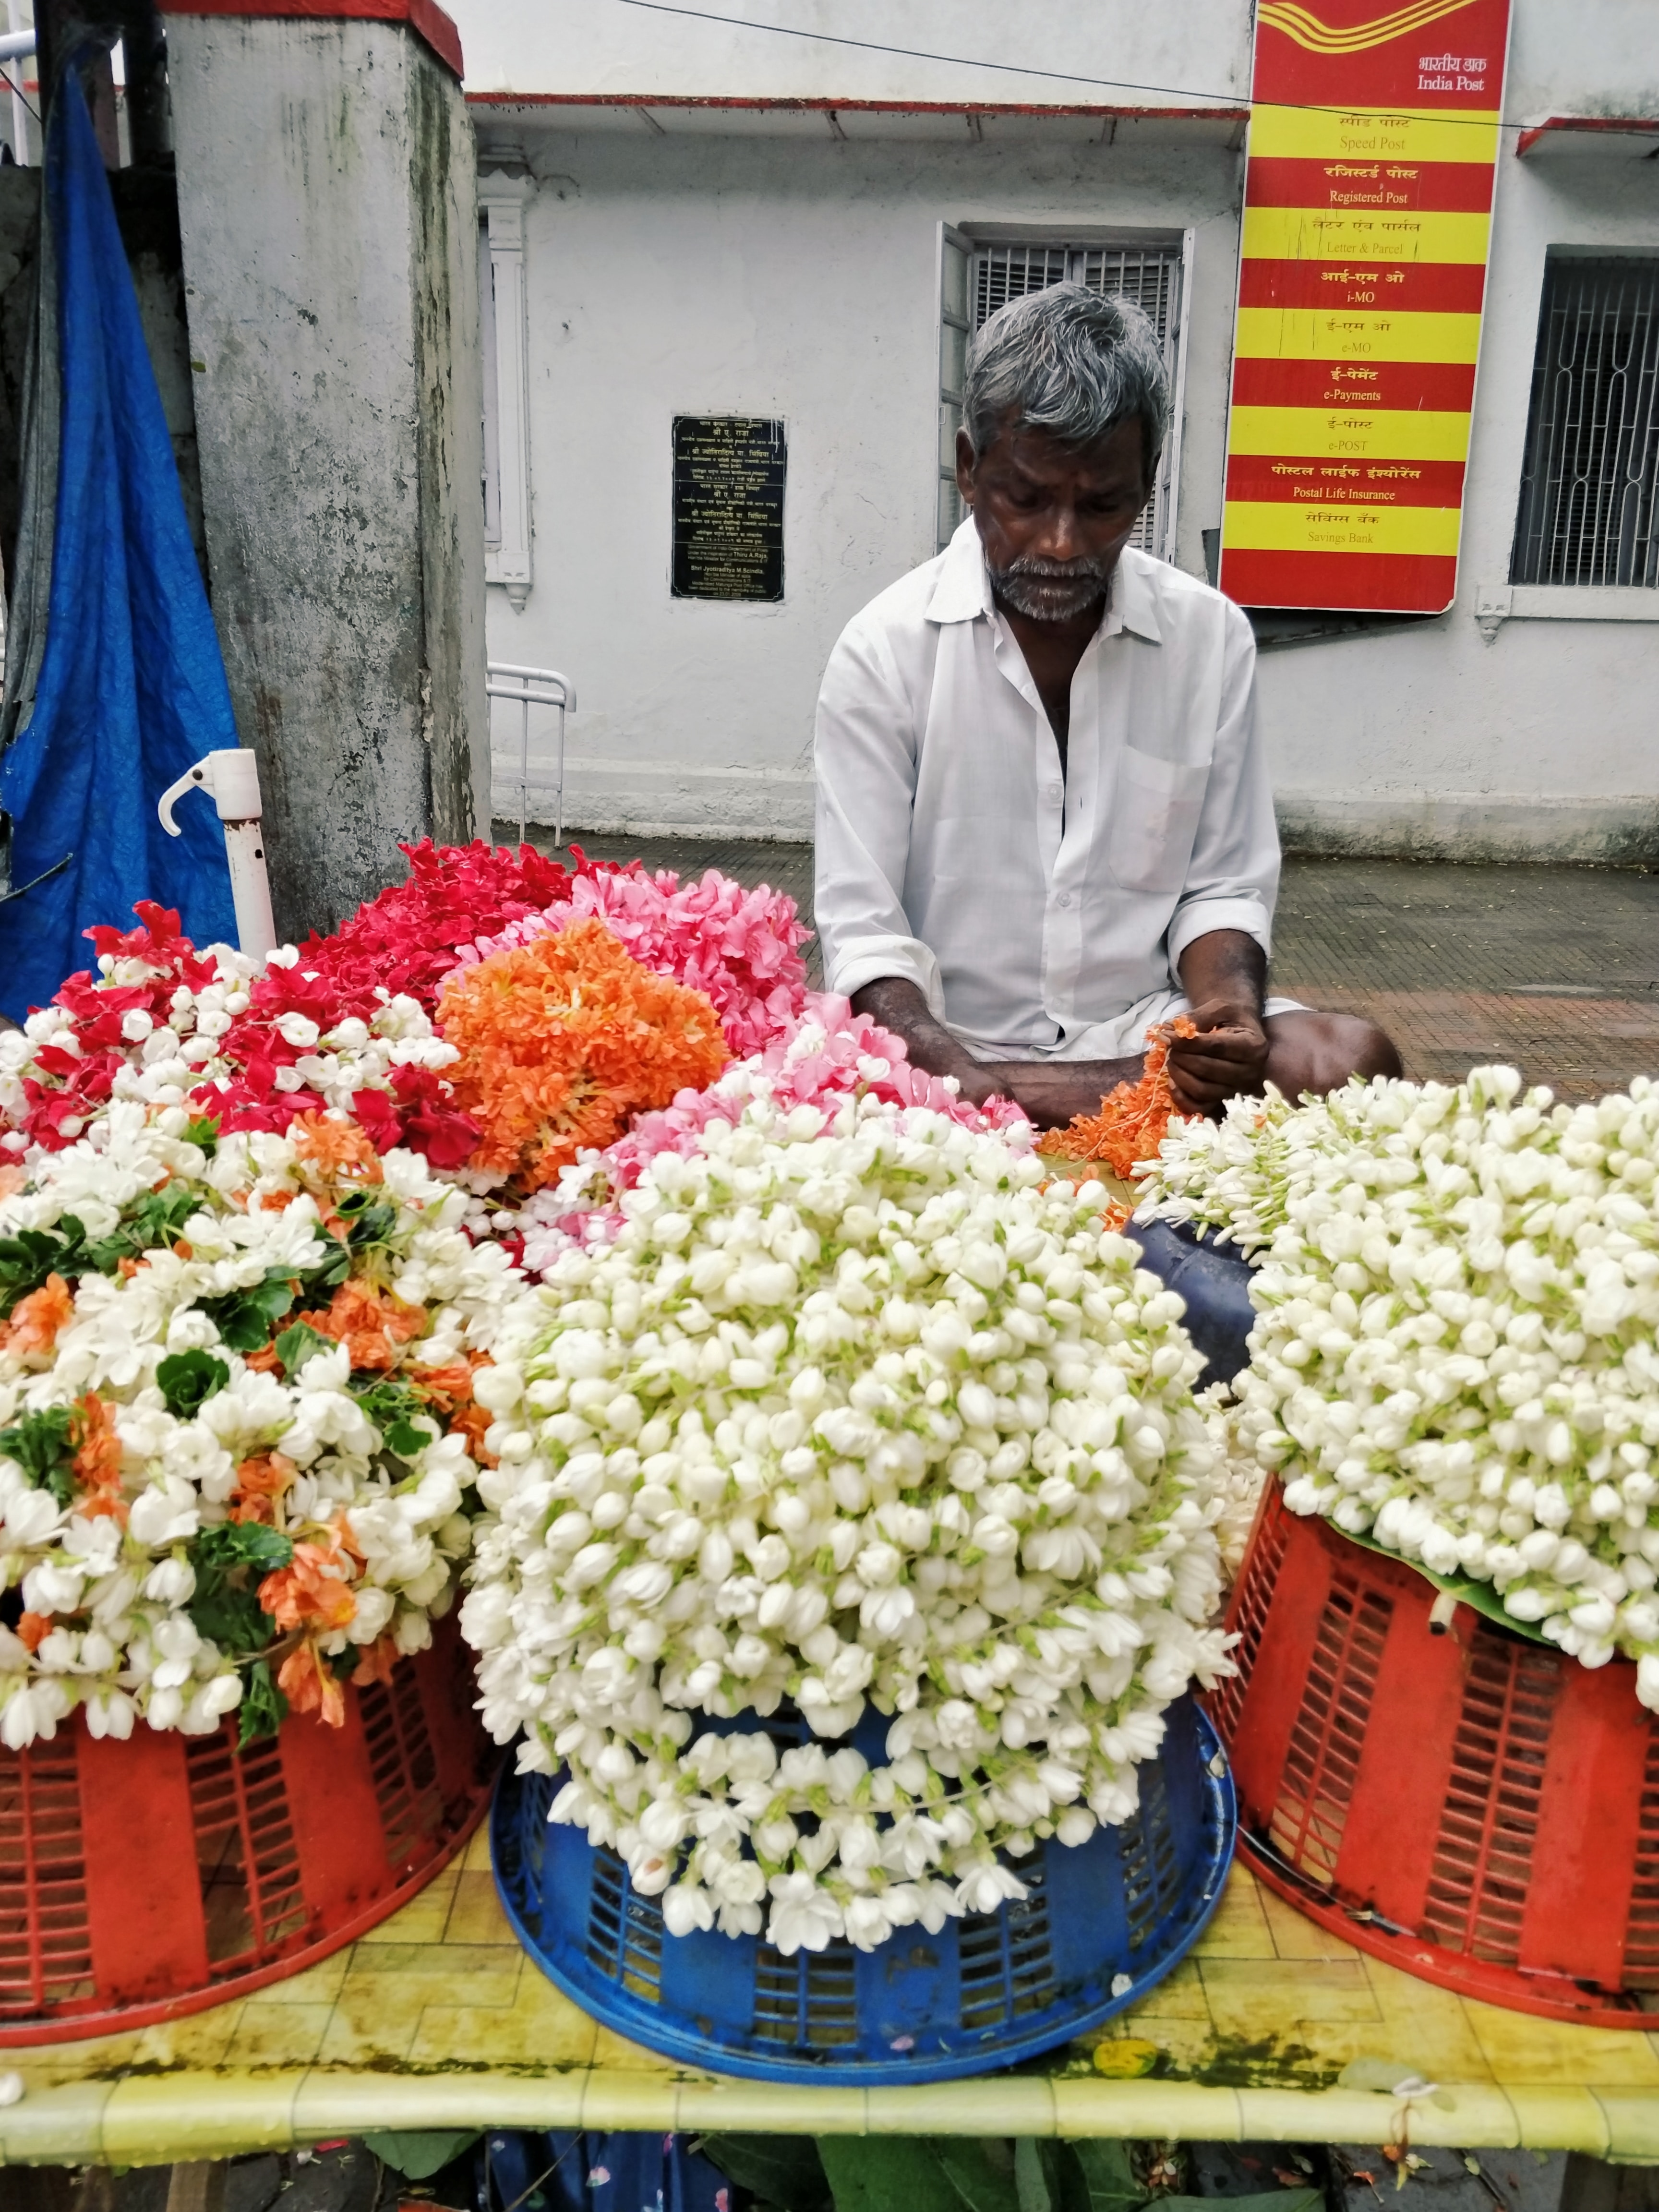 flower market Mumbai, Mumbai sehenswürdigkeiten